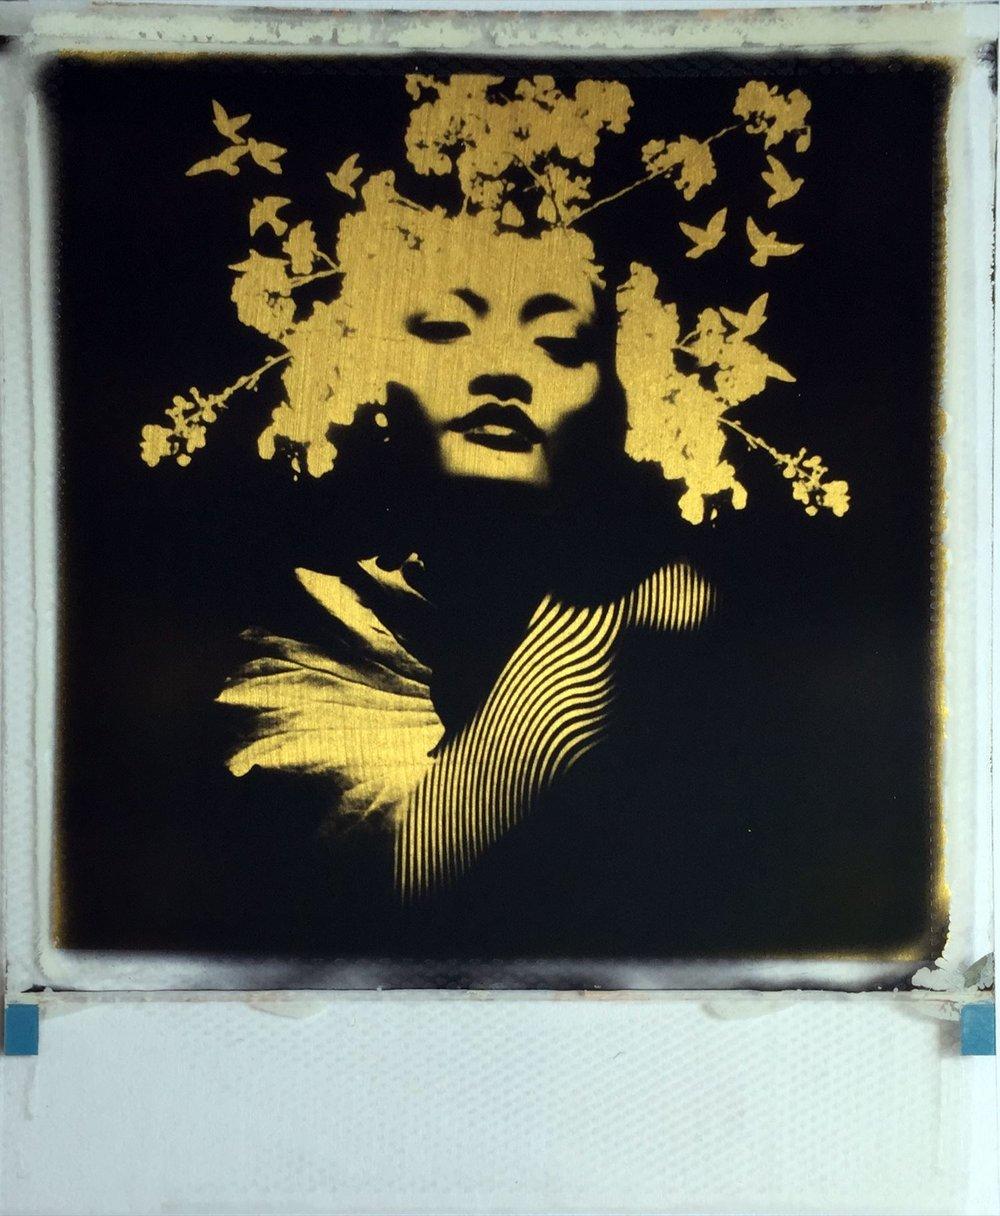 Andrew Millar @ Smithson Gallery